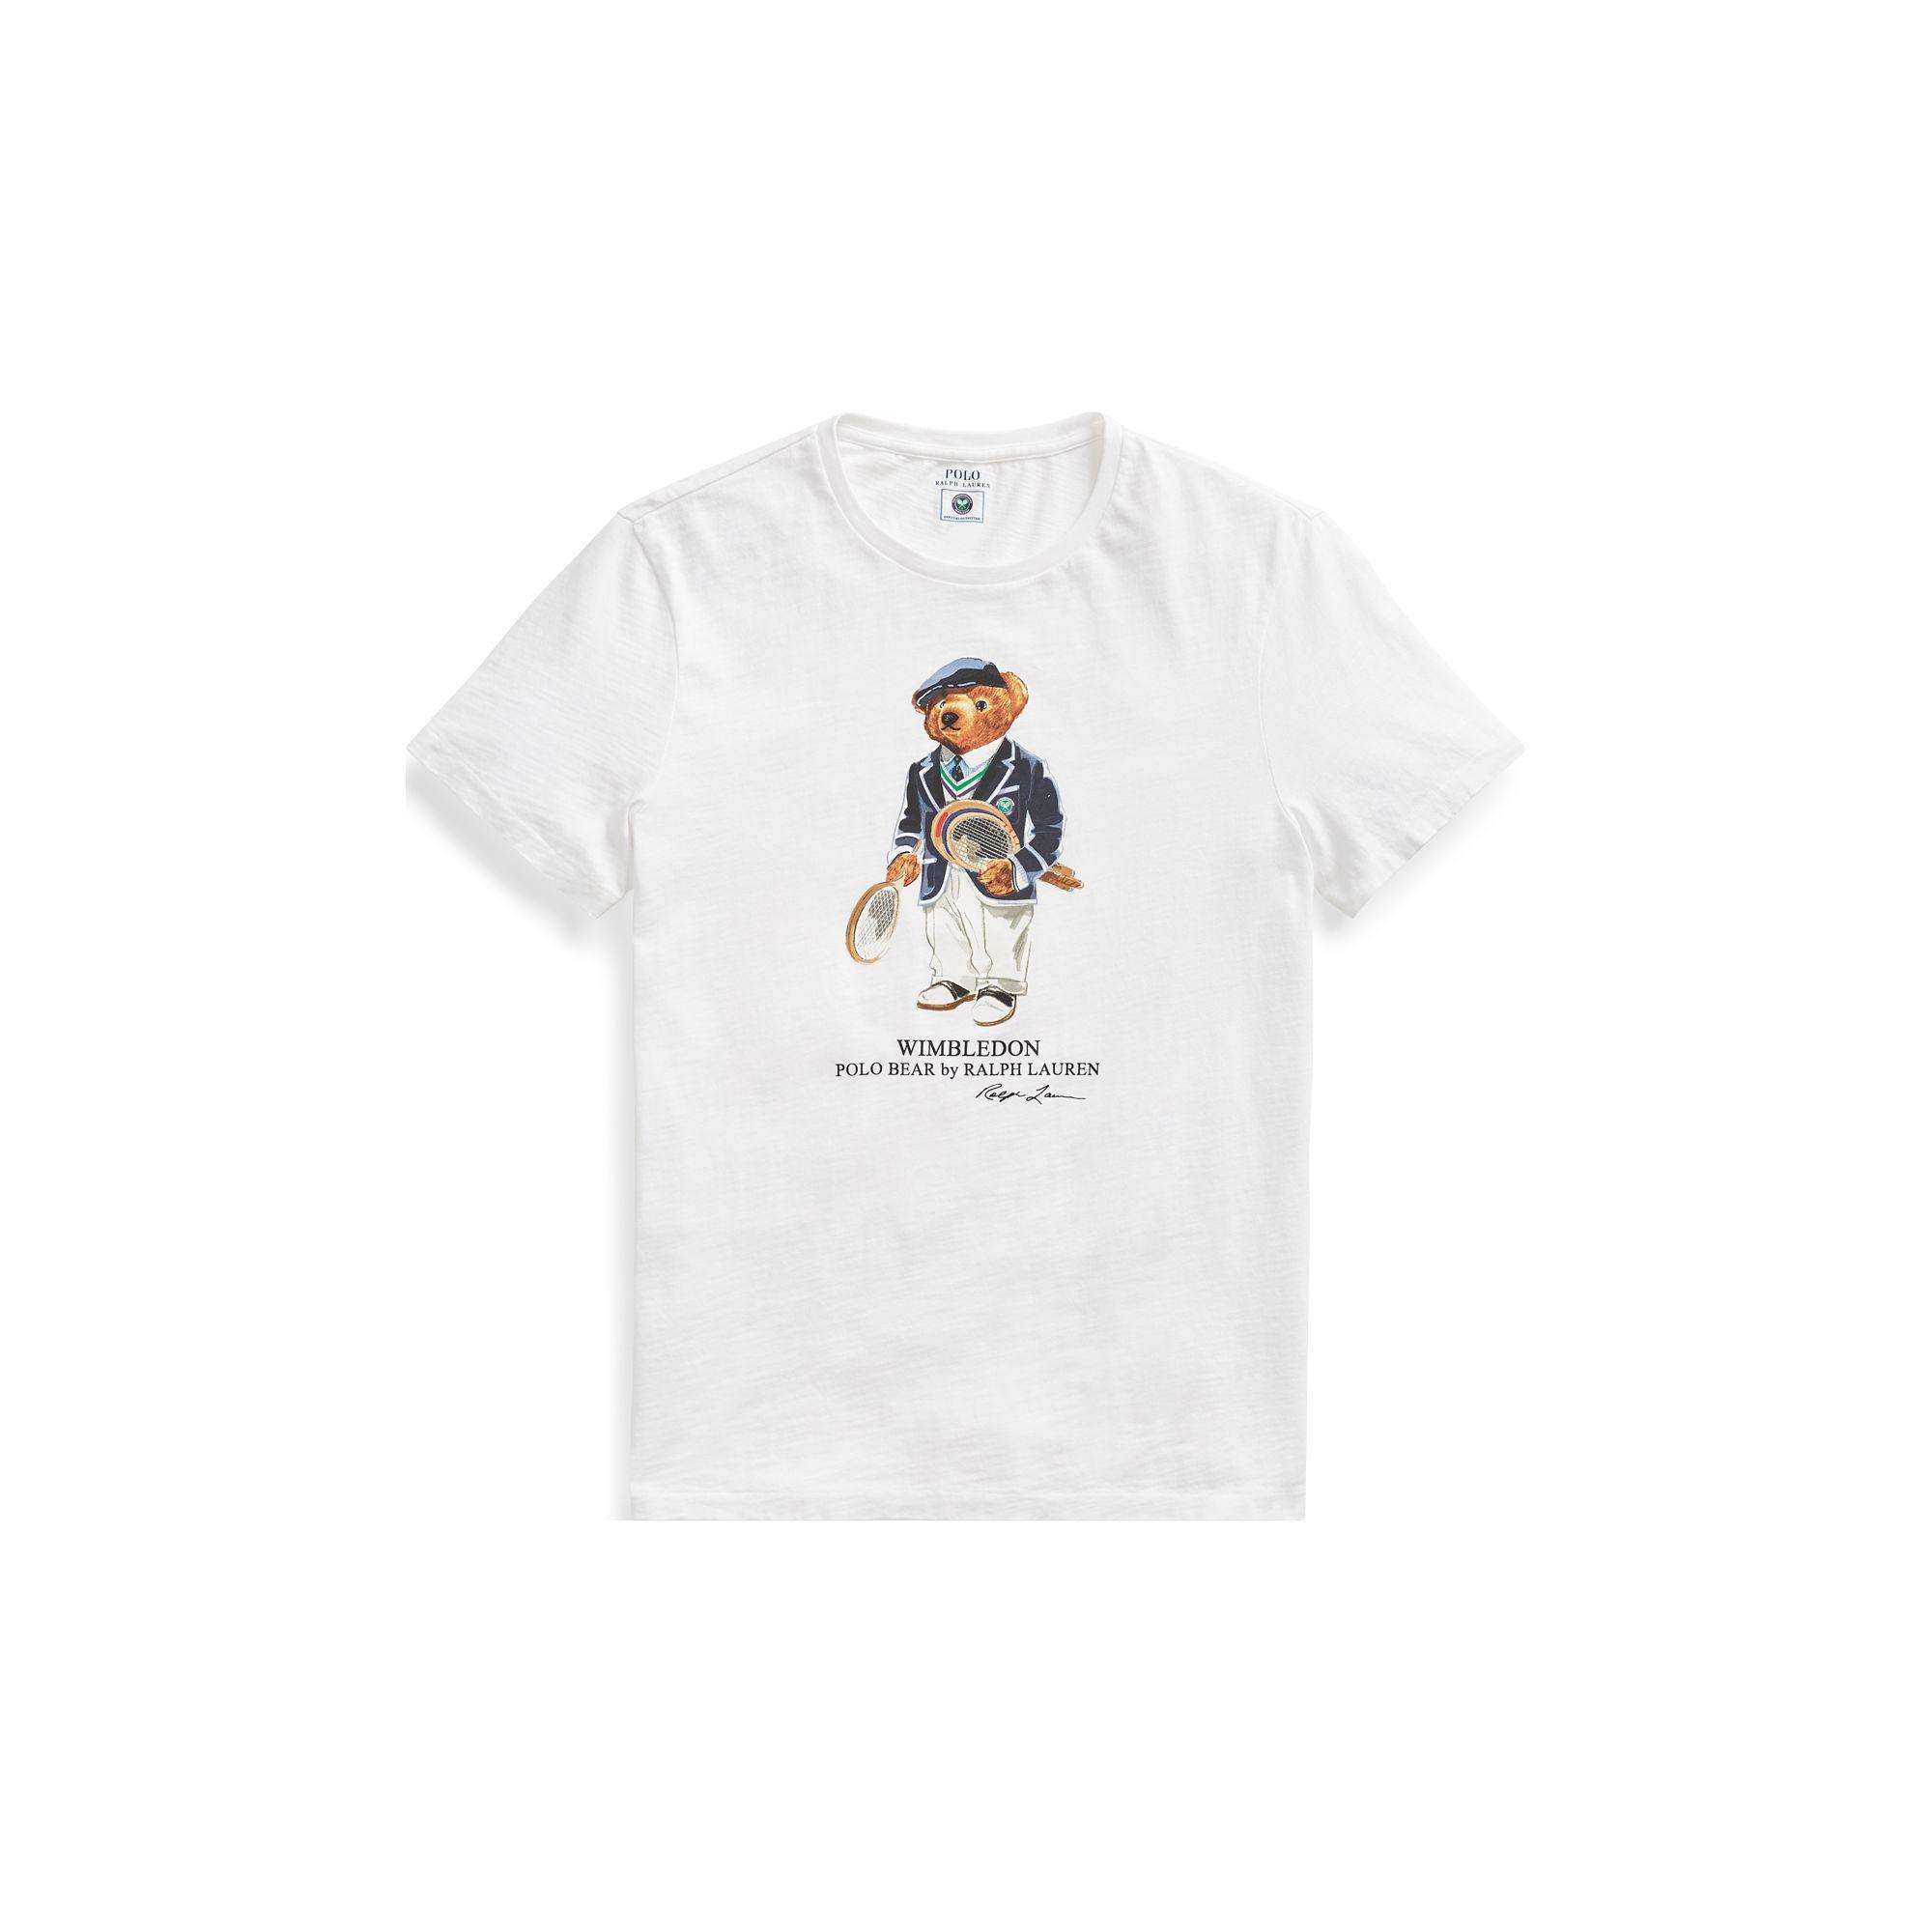 £13 00 R1ifrcwq Mens T Shirt Adidas Questar 7Yf6bgy